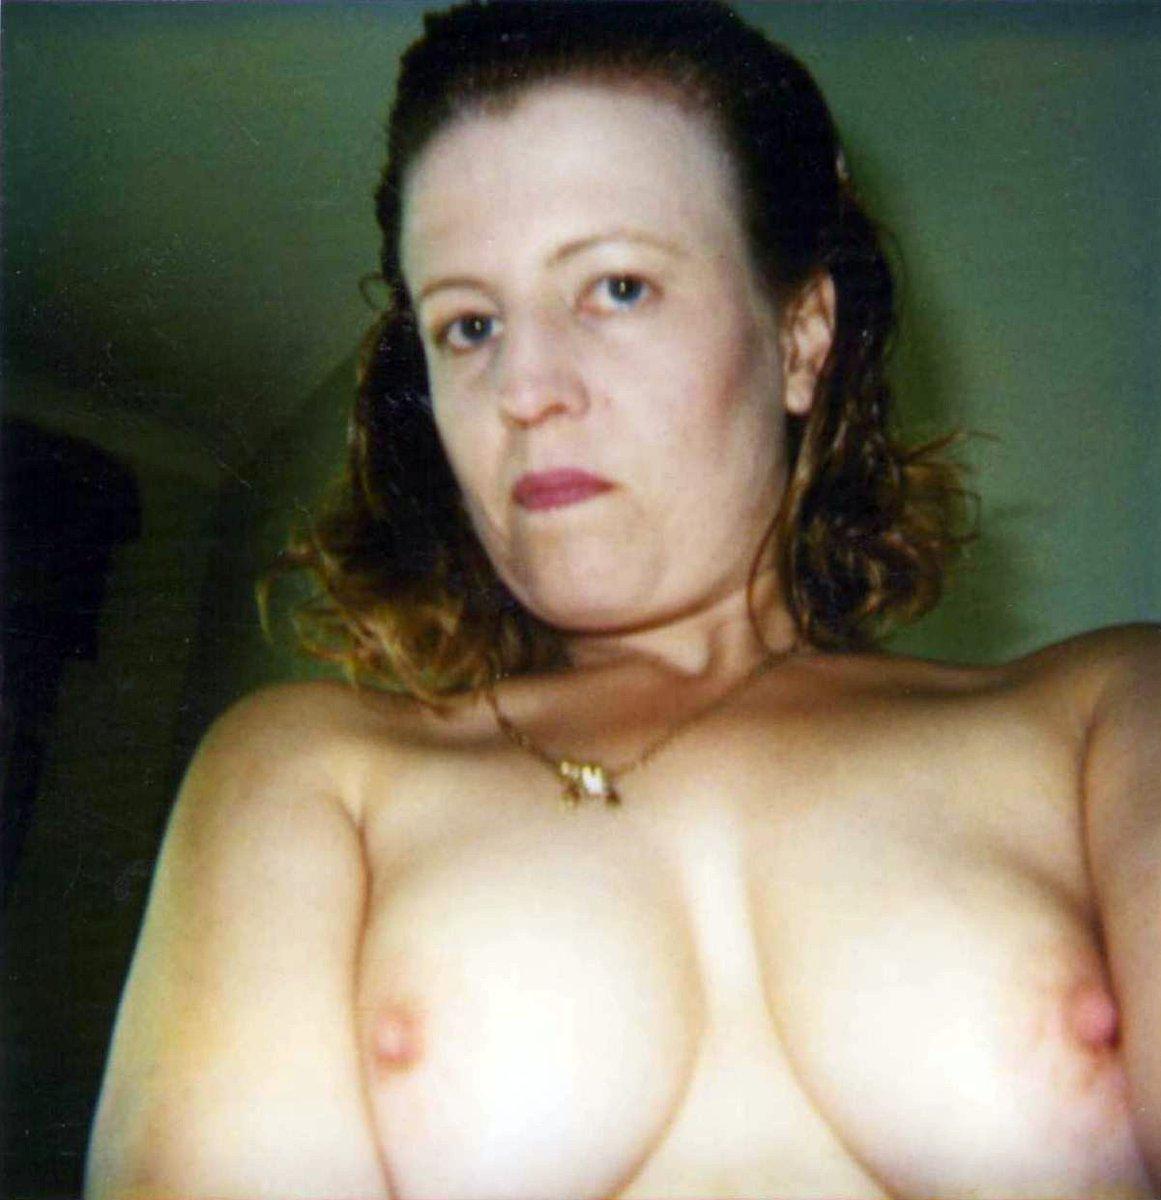 Nude Selfie 8146